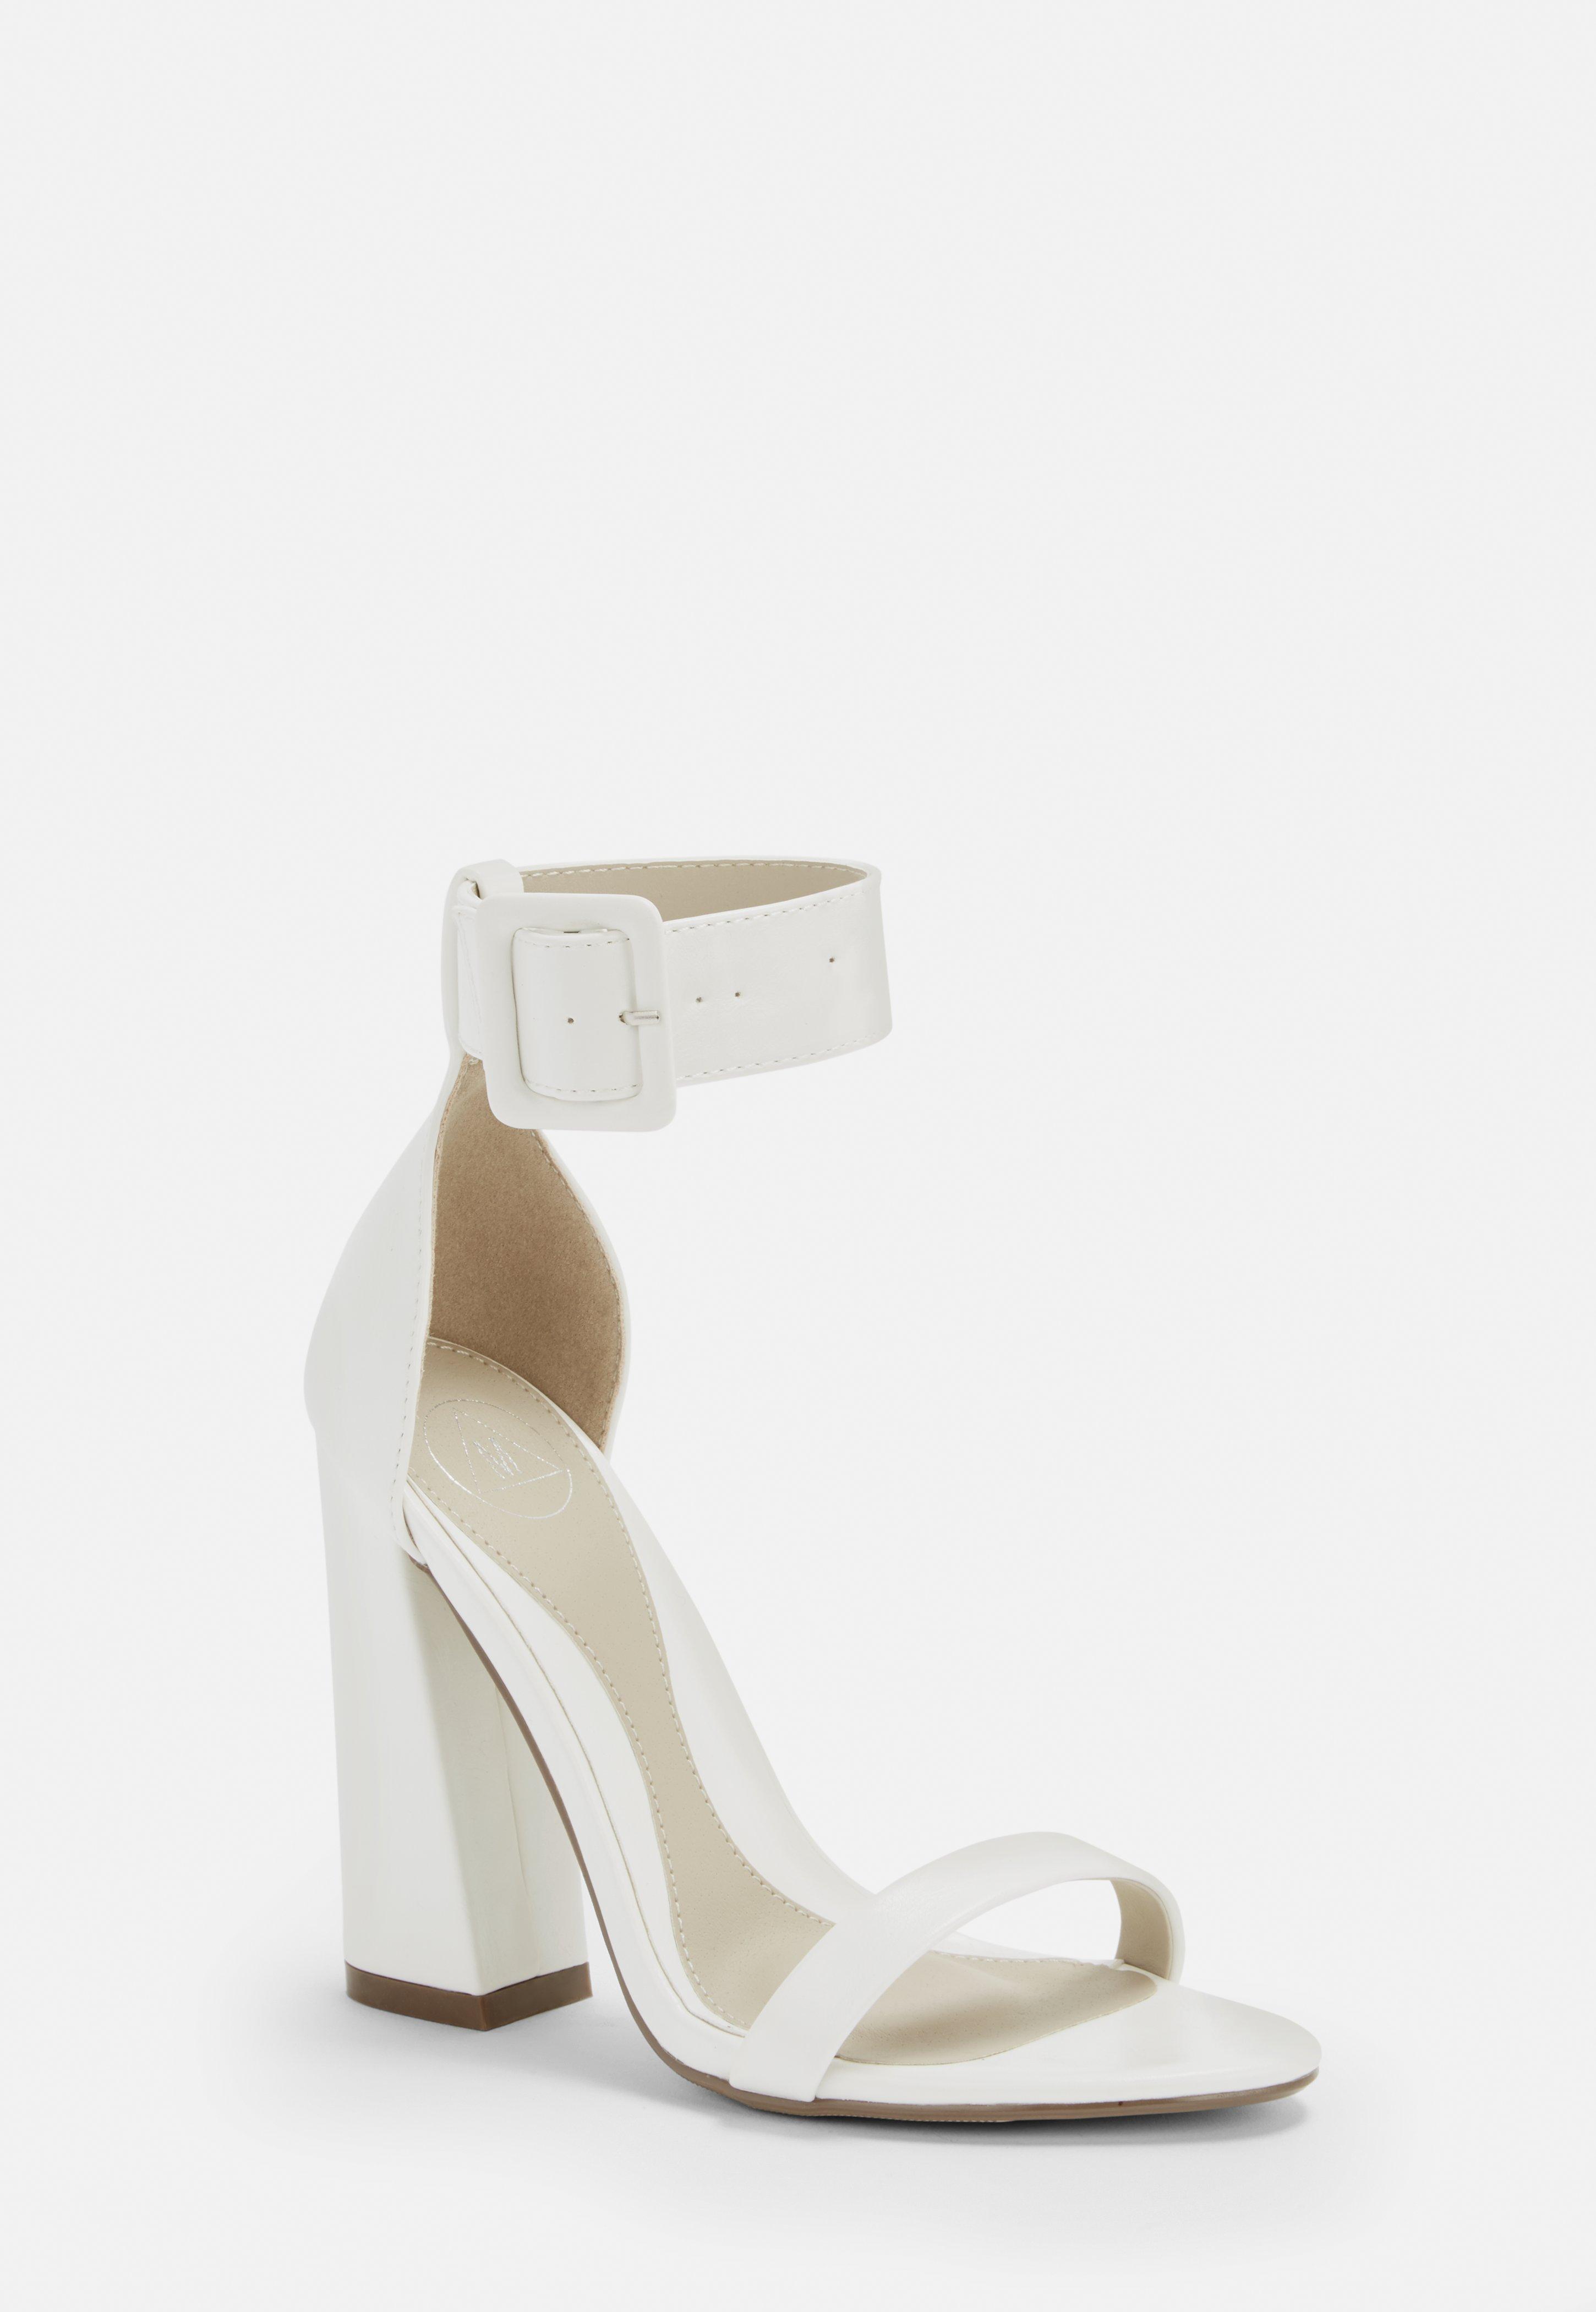 c4ad80f946e Shoes